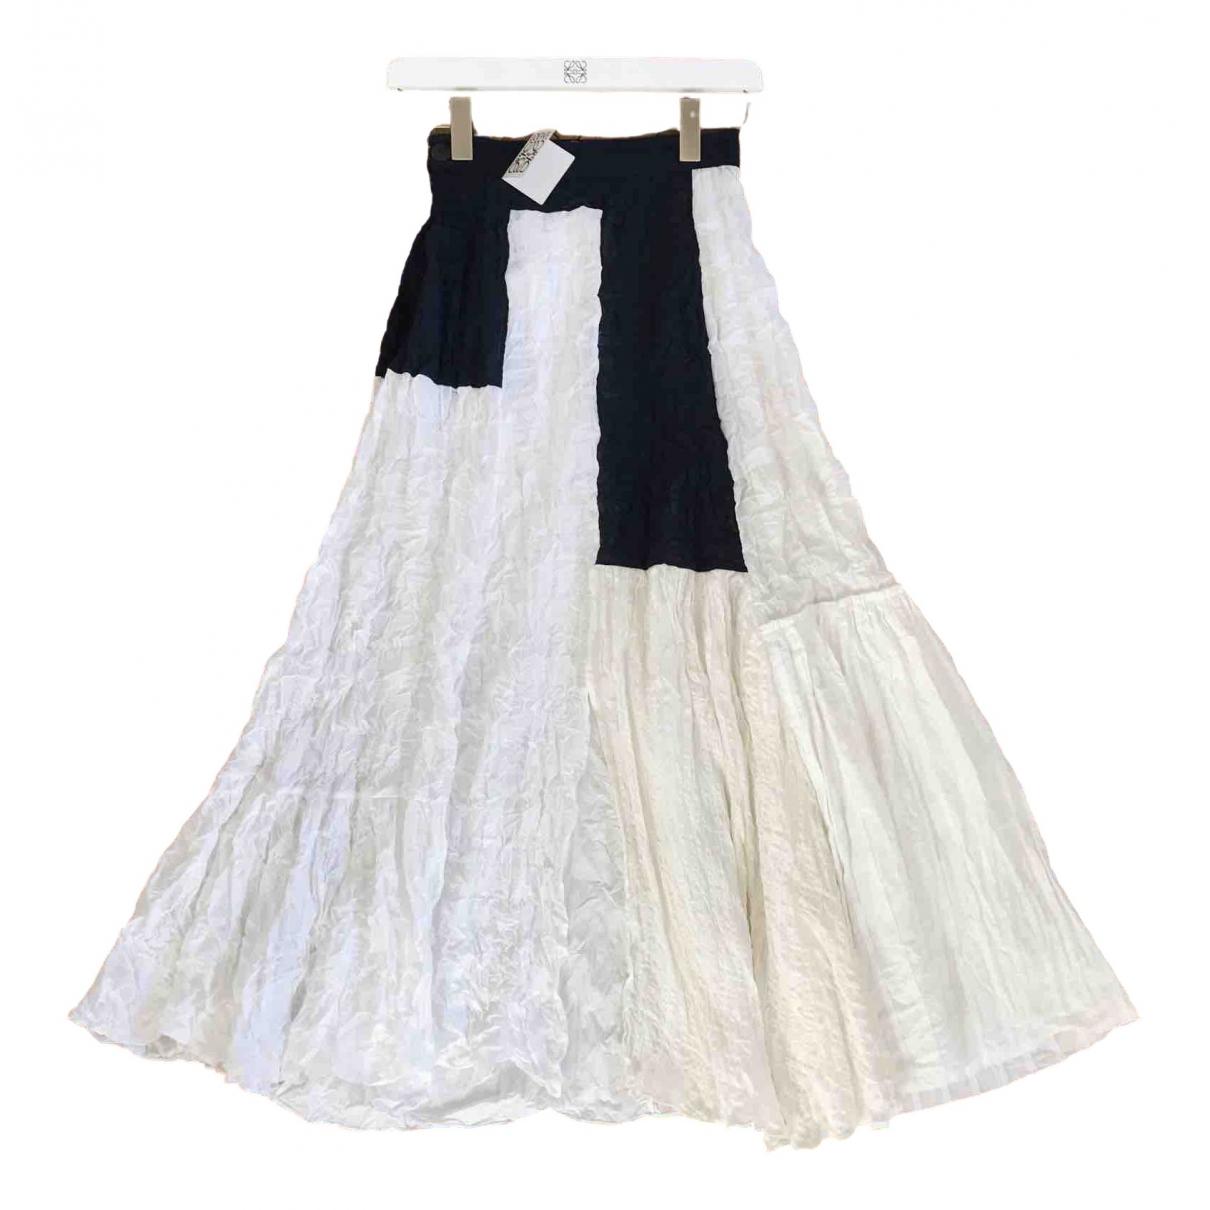 Loewe \N Ecru Cotton skirt for Women 36 FR